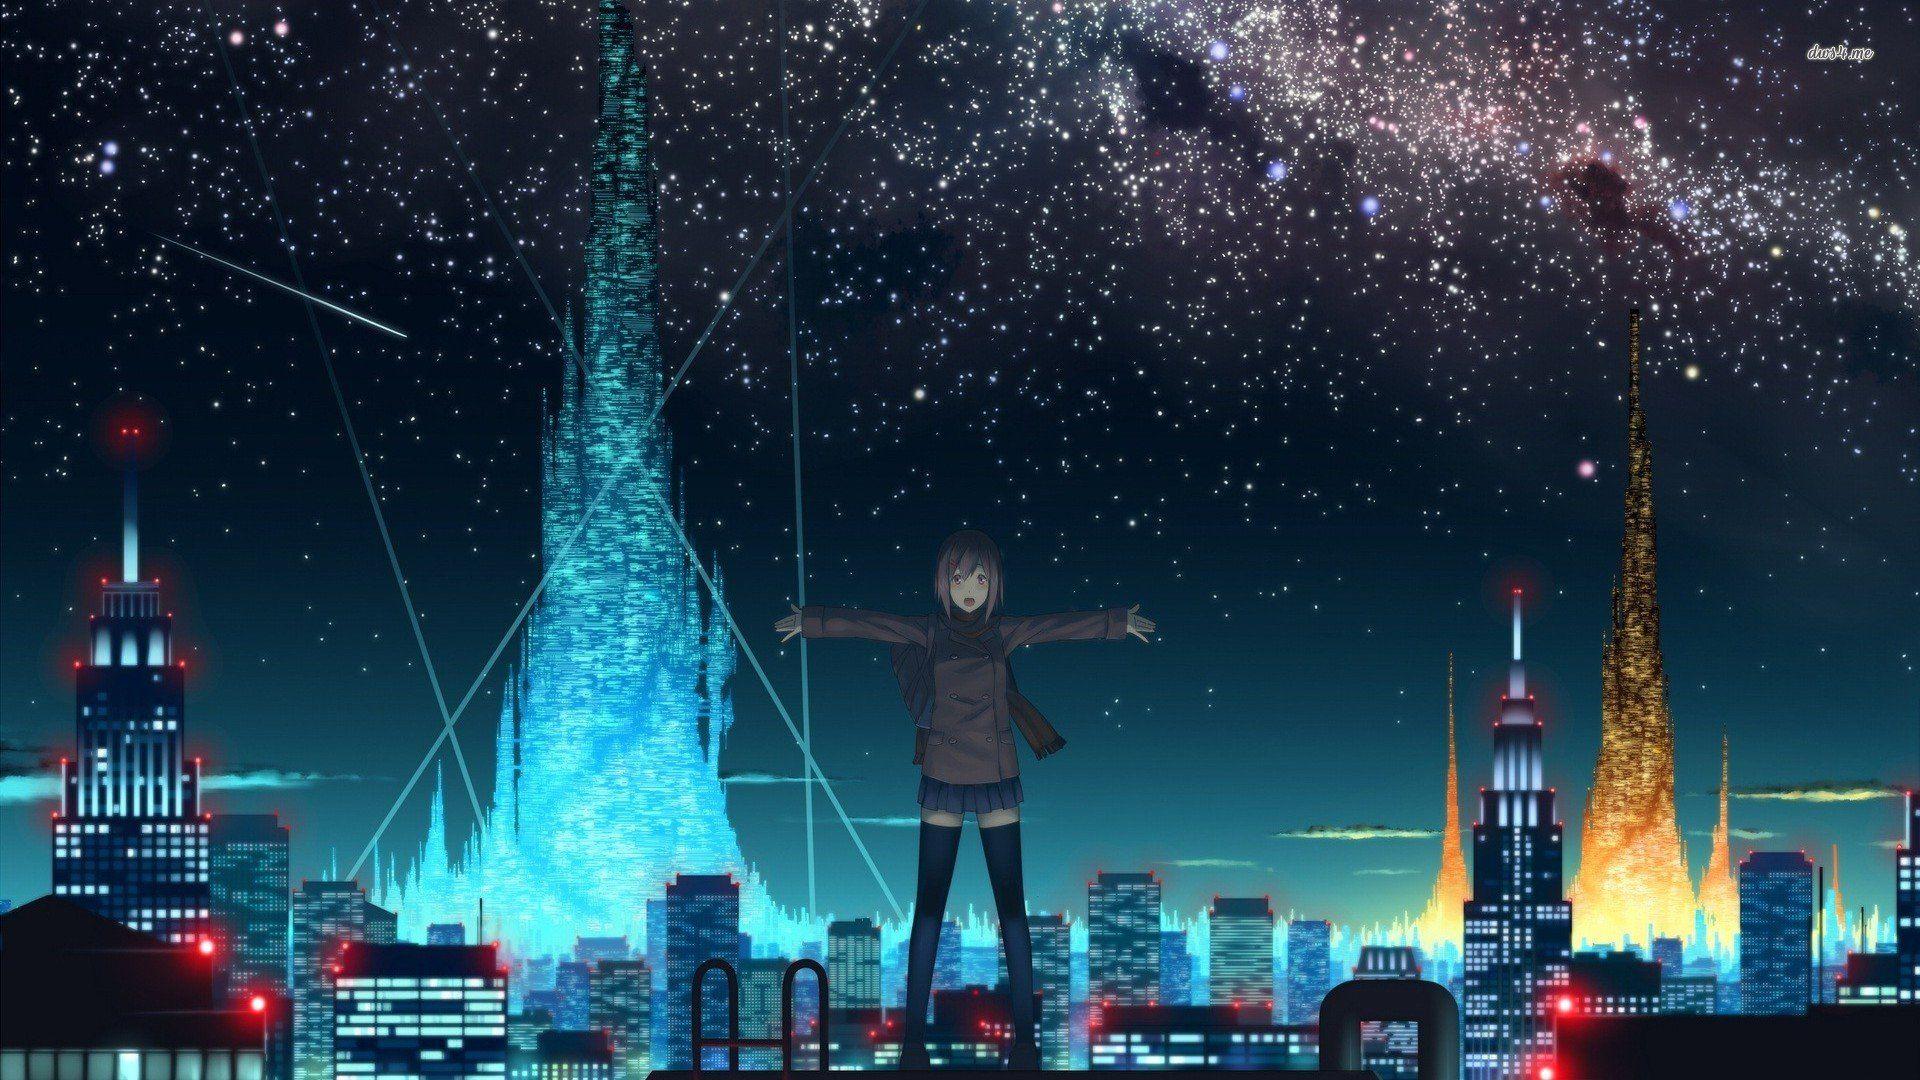 Anime Starry Night Sky Wallpaper Background Monodomo in